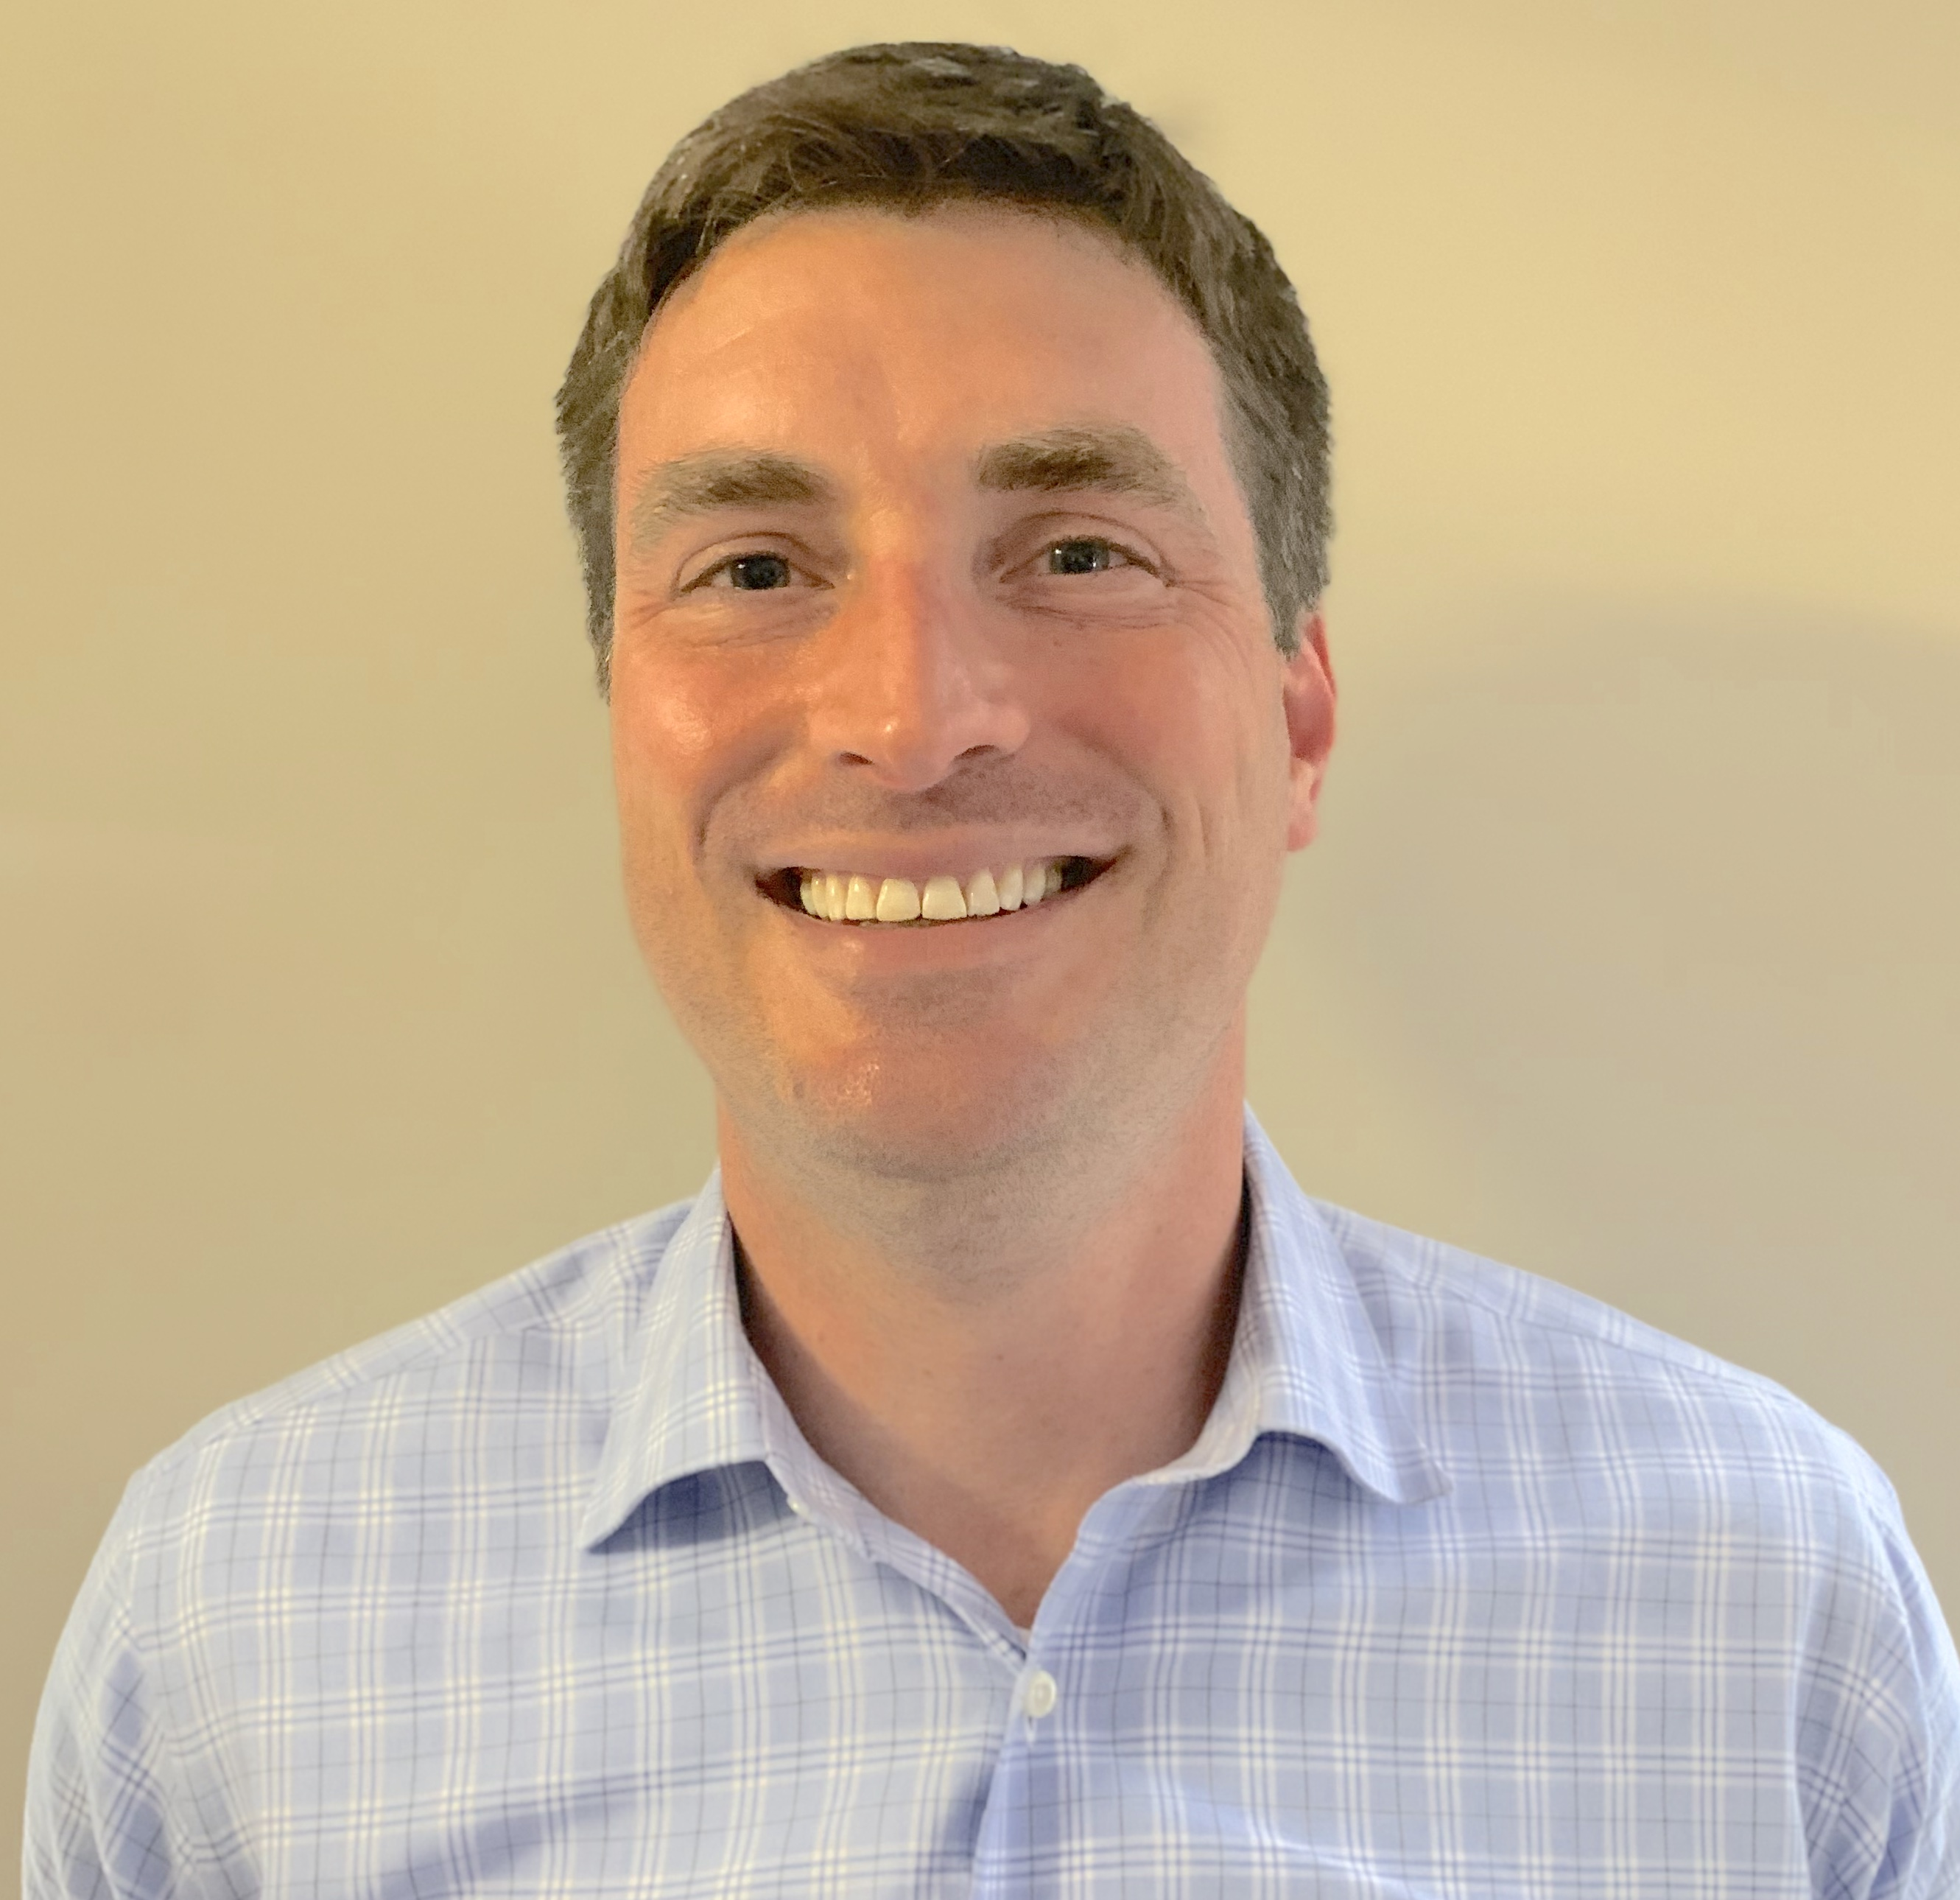 John Becker, Head of Product, Mindmarker